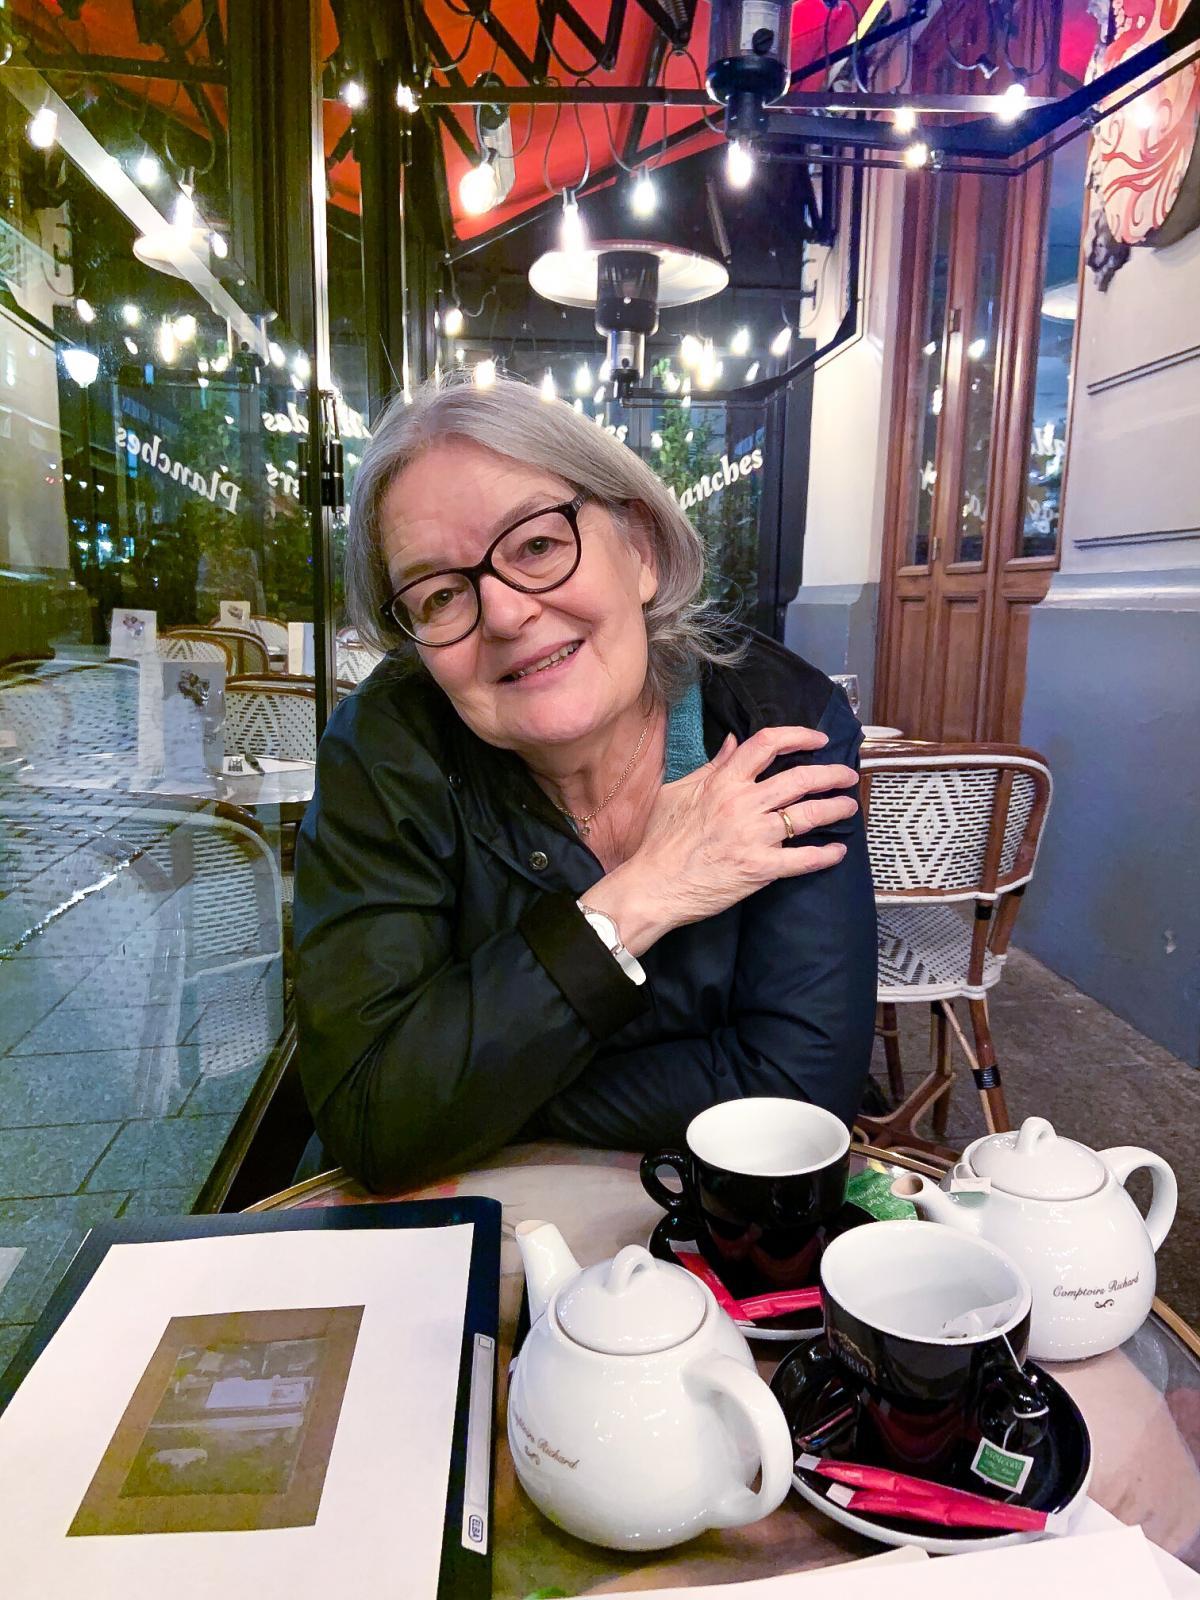 French archivist Caroline Piketty